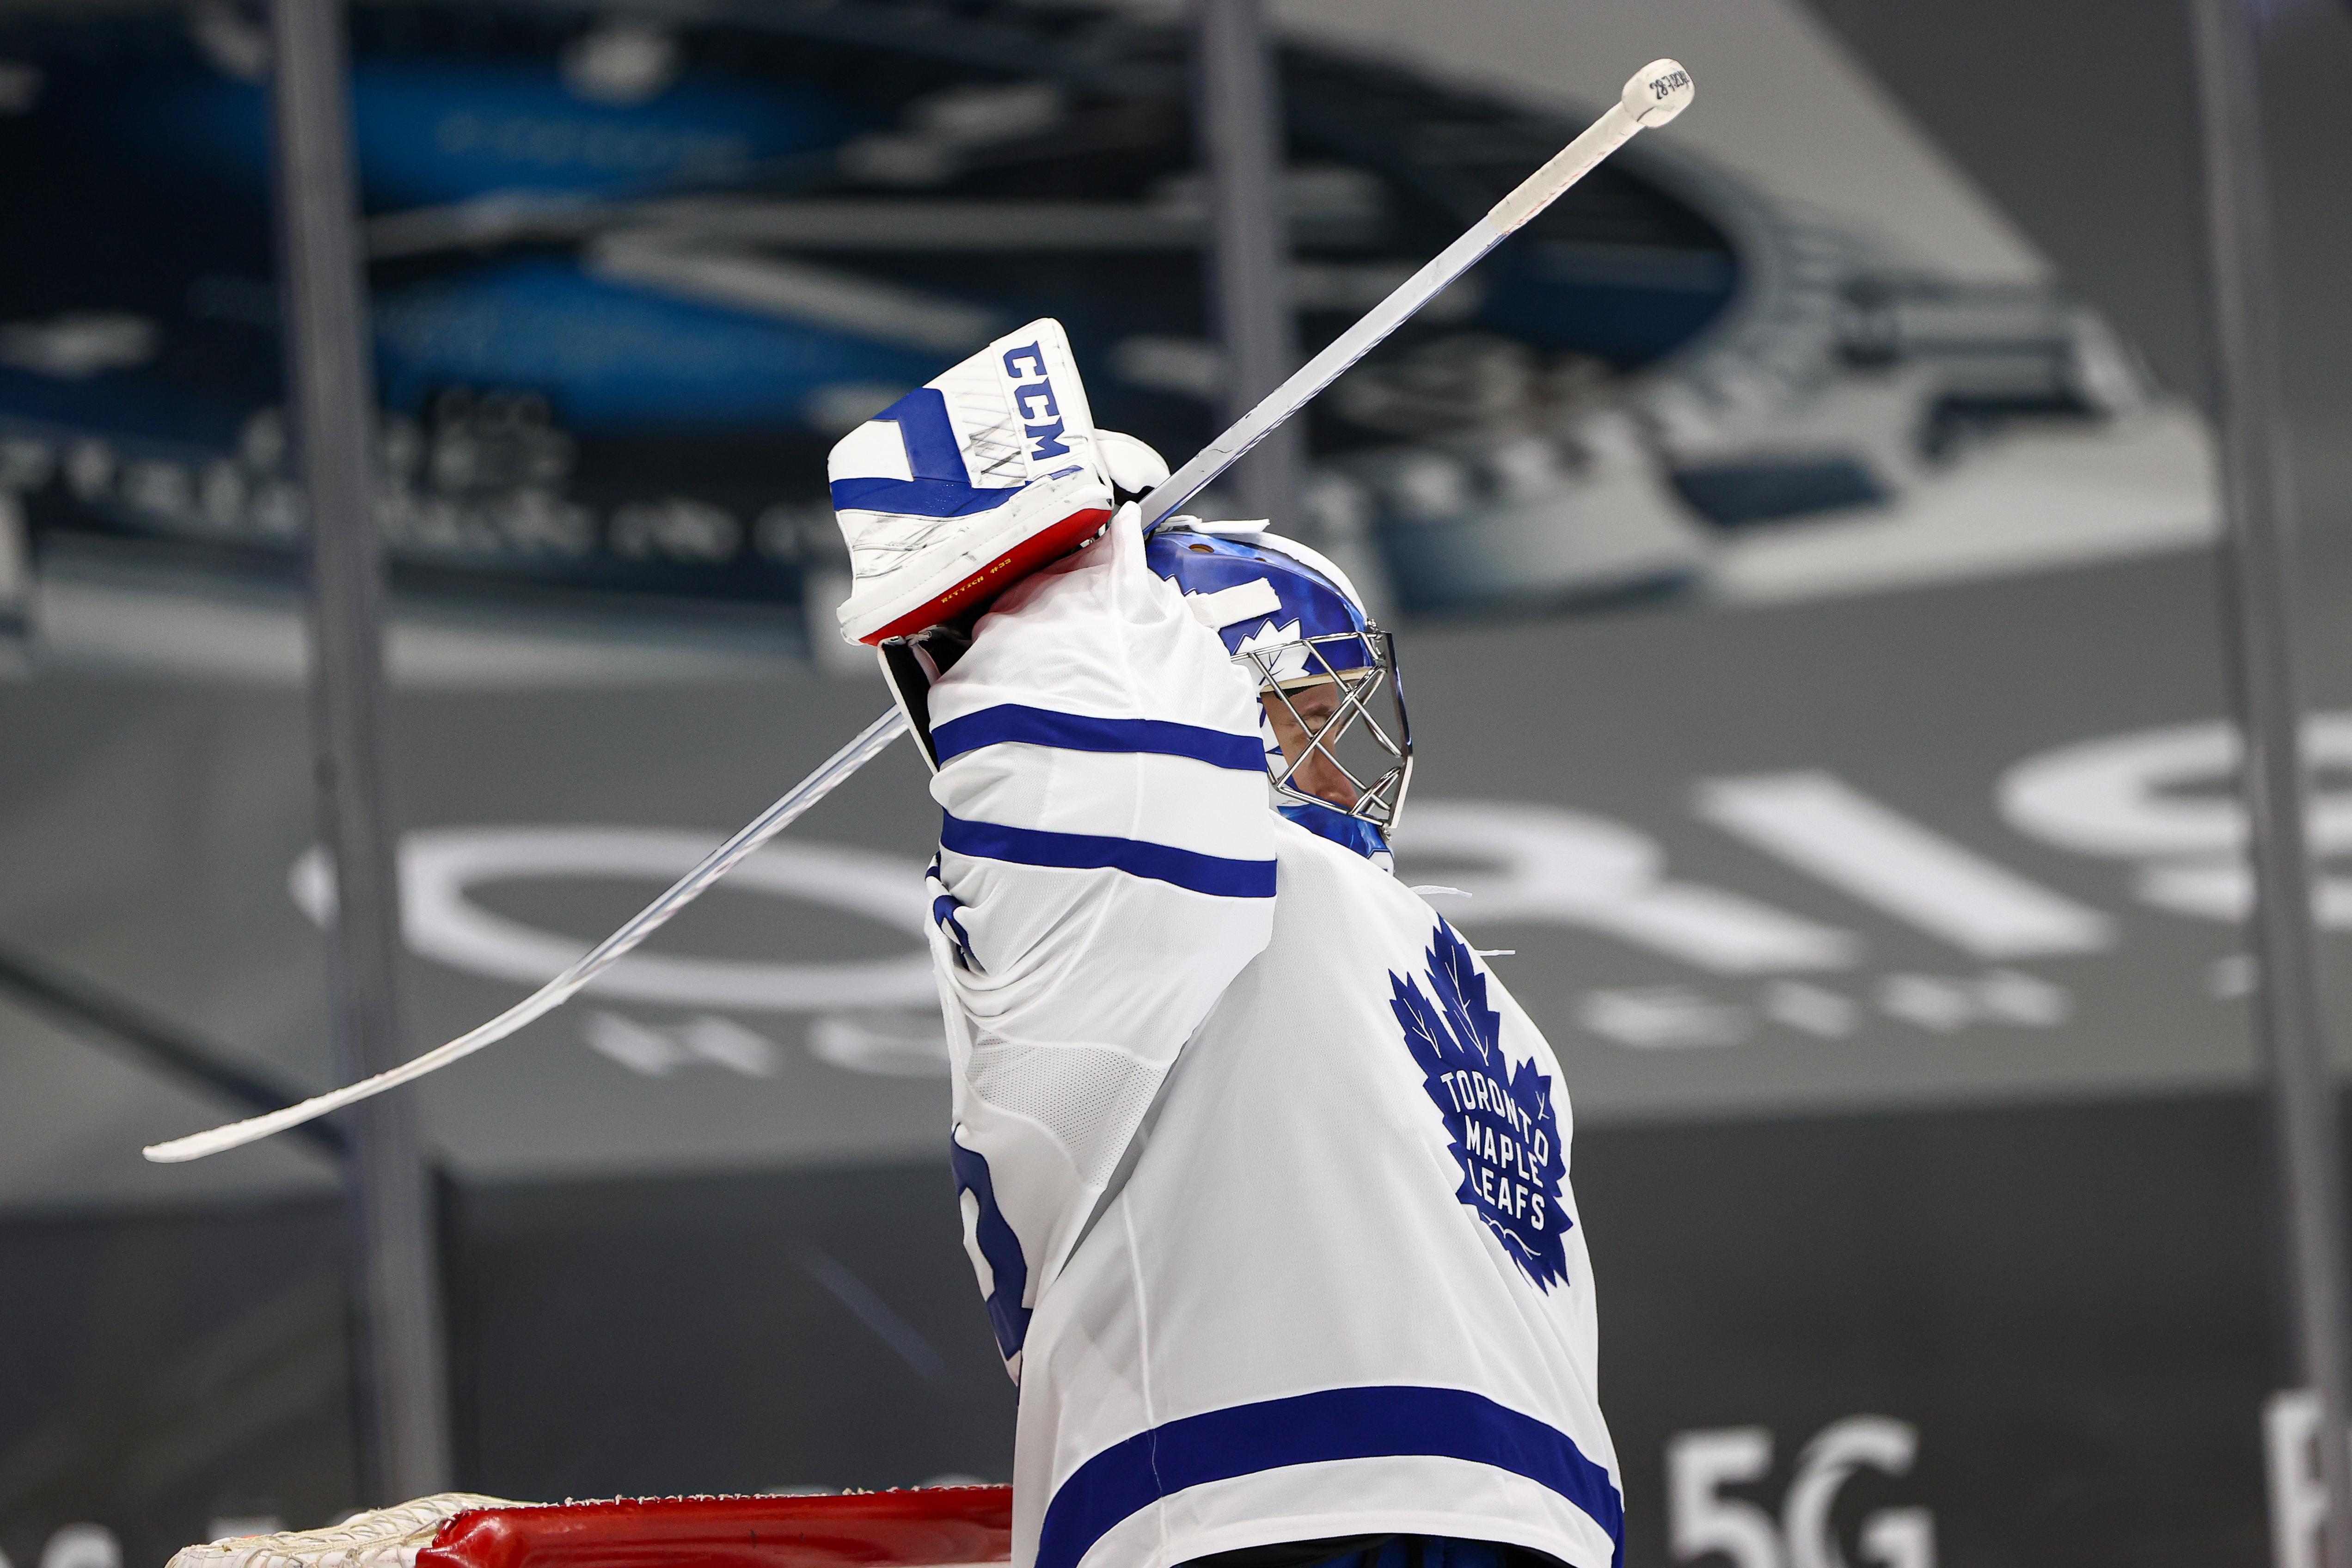 NHL: APR 20 Maple Leafs at Canucks